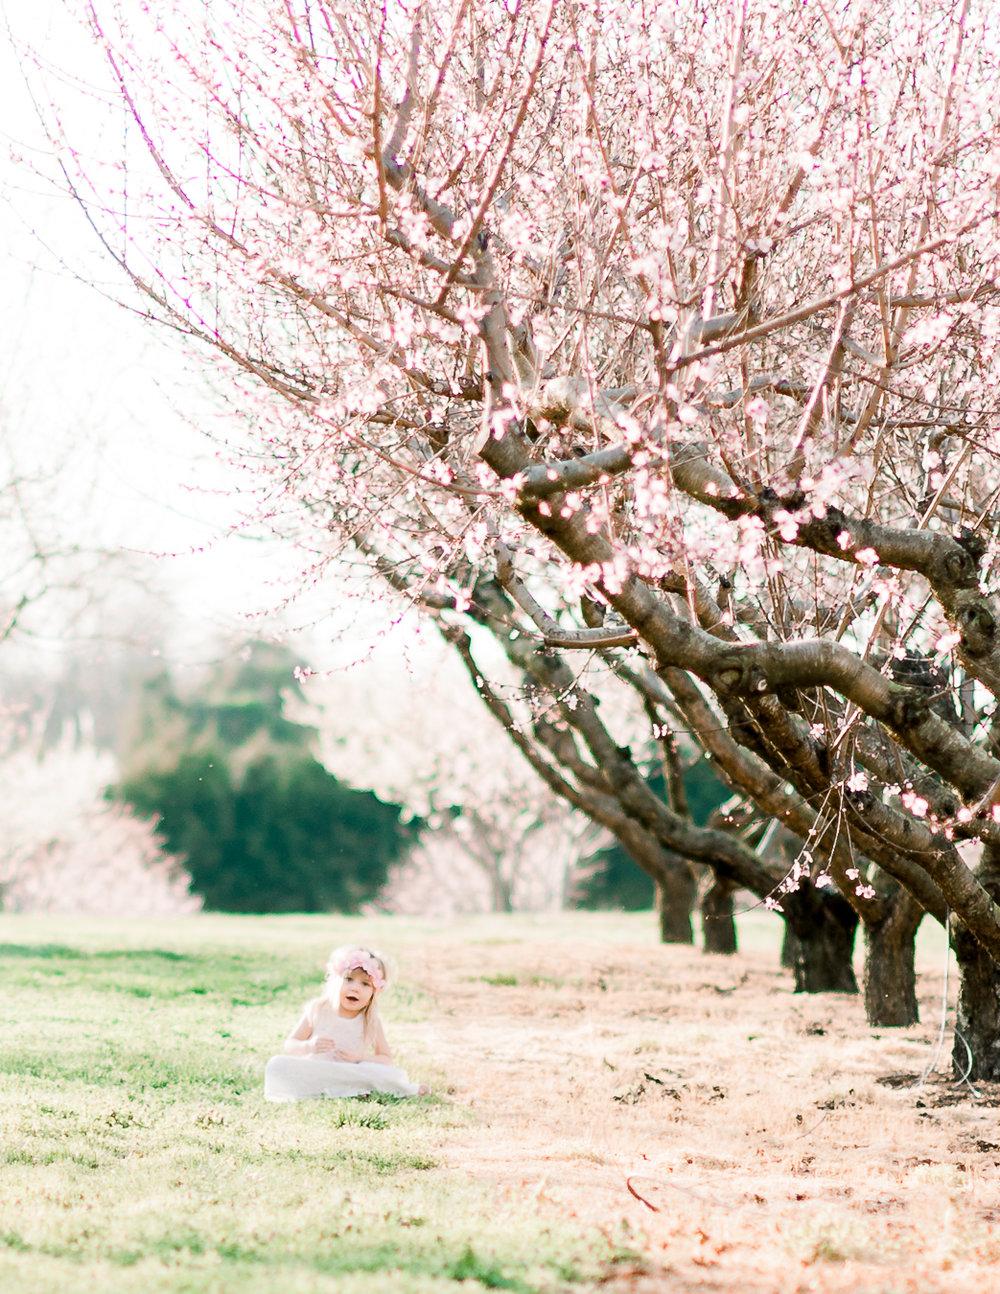 fredericksburgphotographer_cherryblossoms_MomandMe_familyphotos_youseephotography_Sarahfam (39).JPG